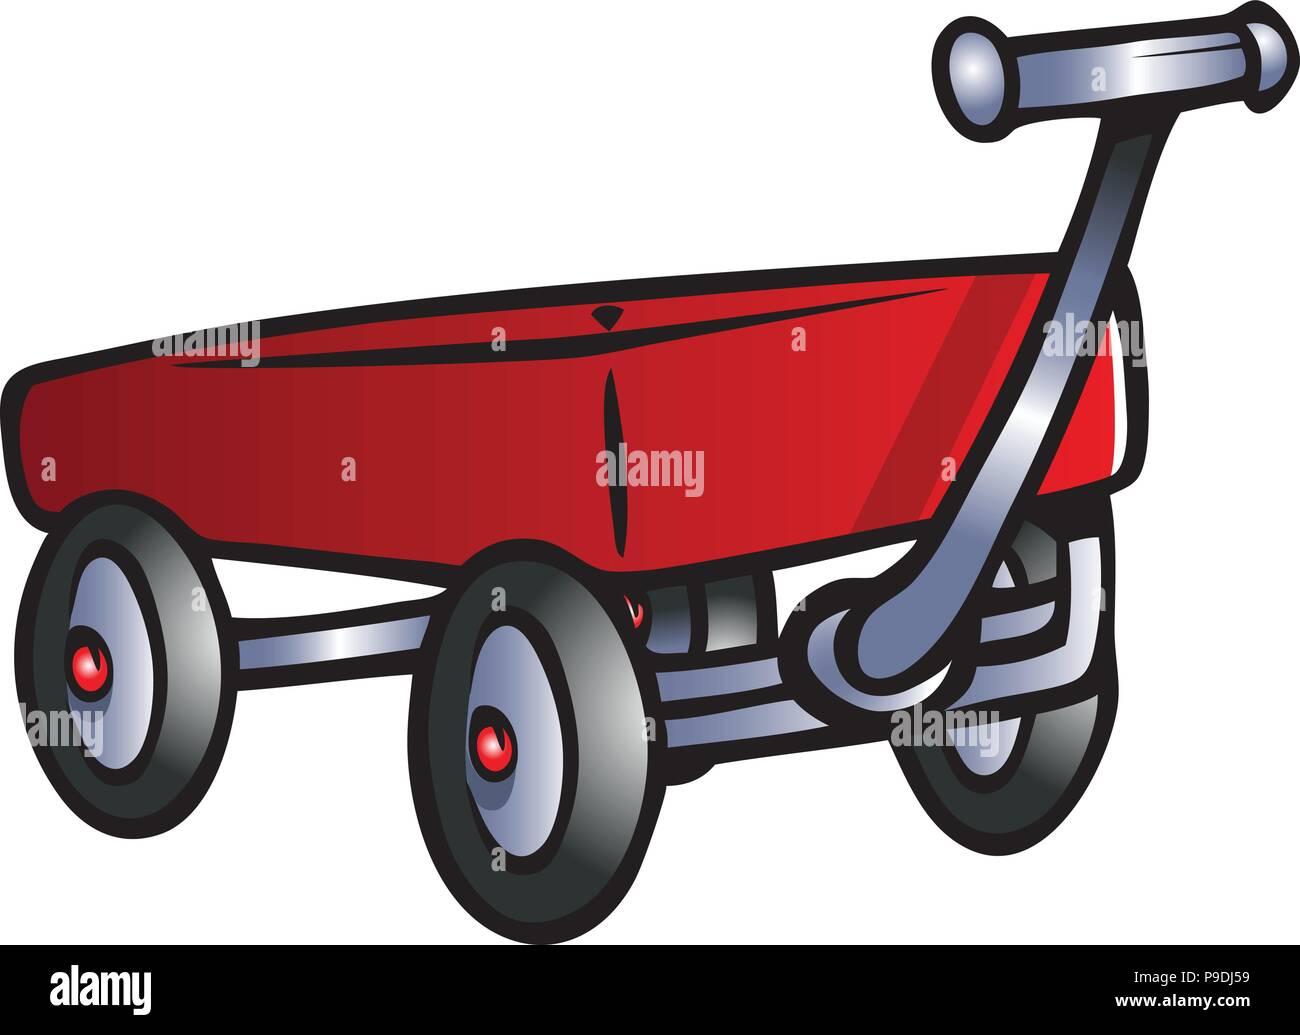 Cartoon Vector Illustration Of A Red Wagon Stock Vector Image Art Alamy